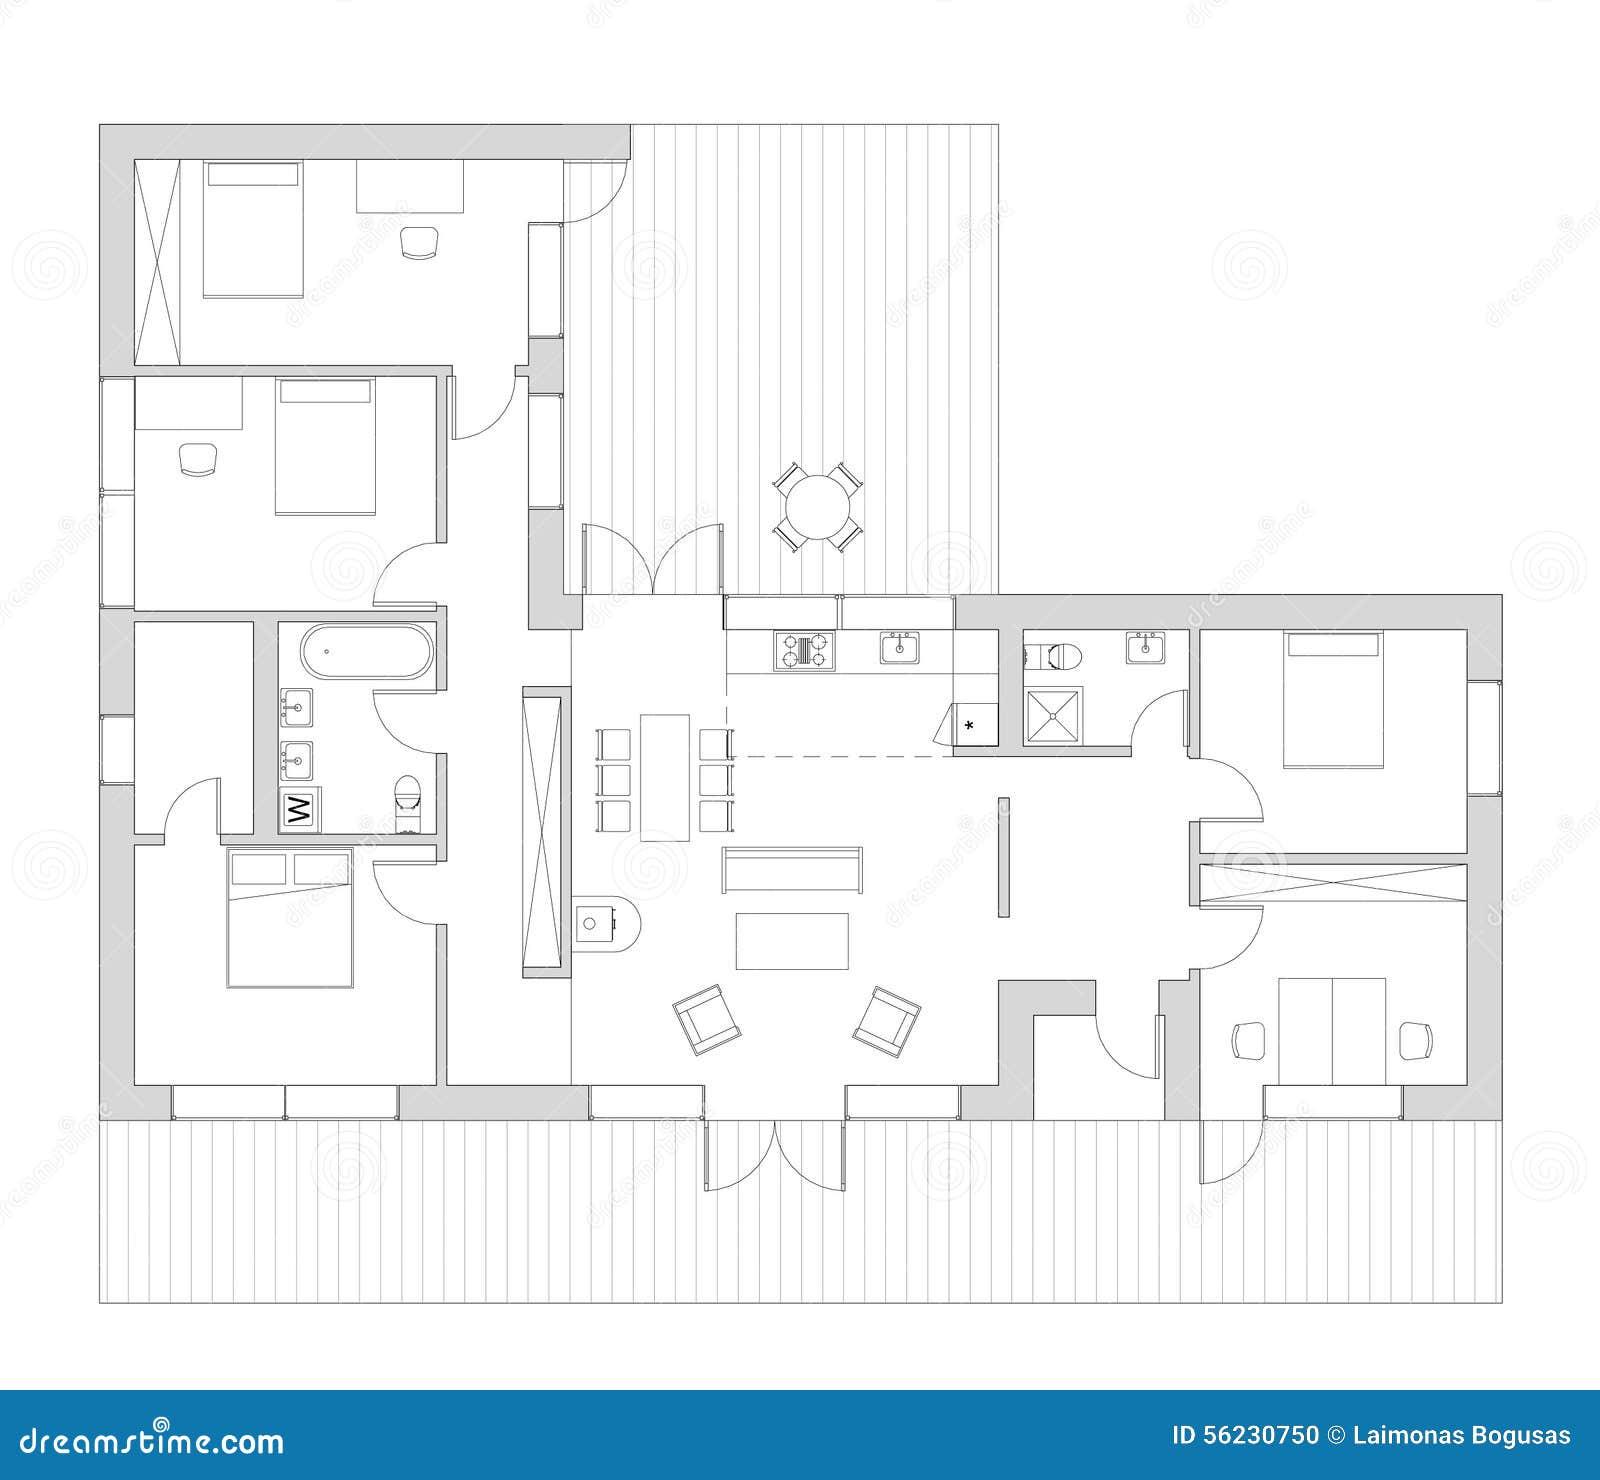 Ot da planta baixa a casa viva ilustra o stock imagem - Casa unifamiliare dwg ...